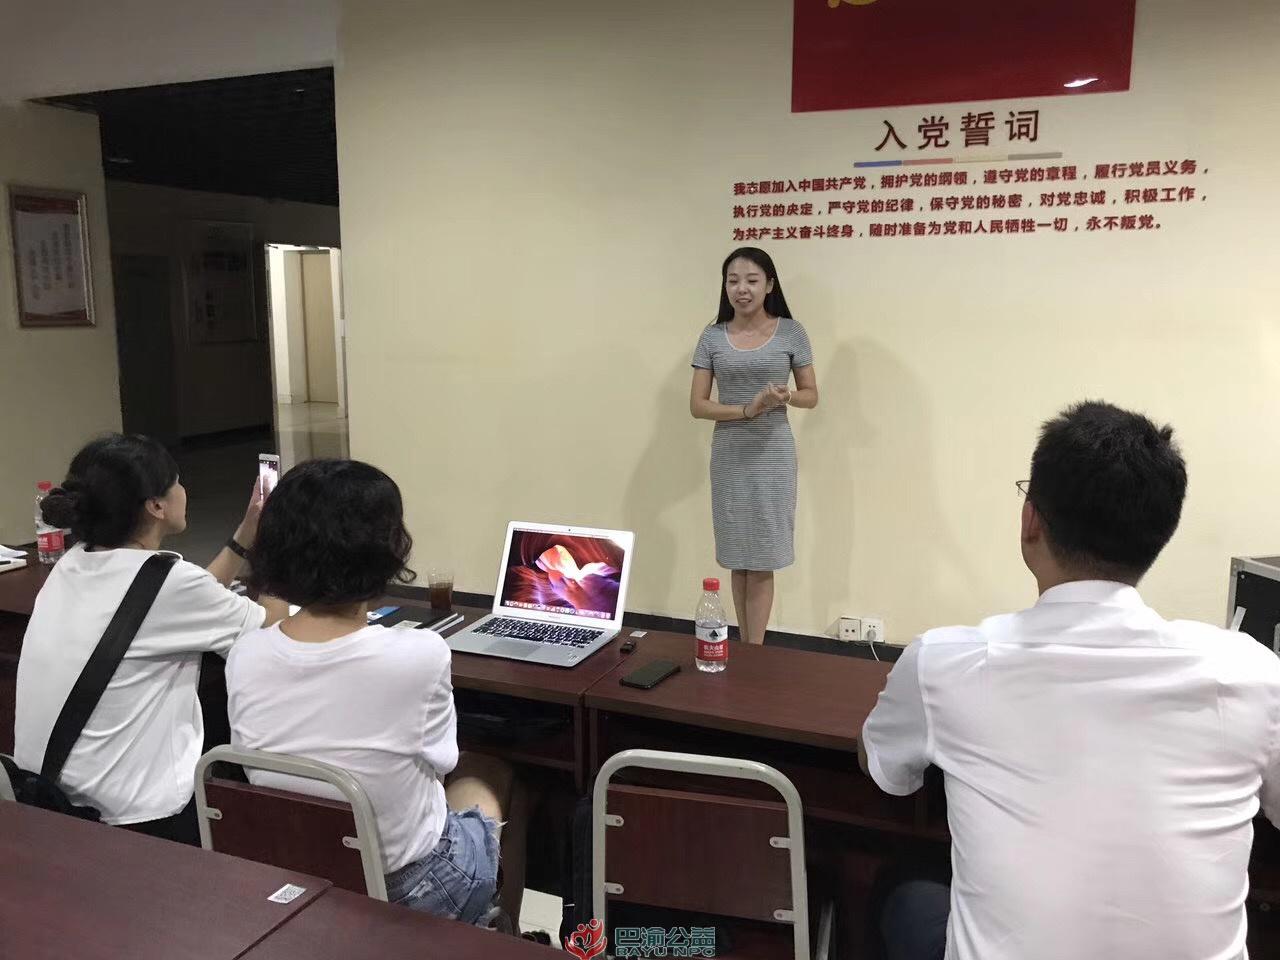 023RunClub 在国贸中心开展 HS 导师内训活动